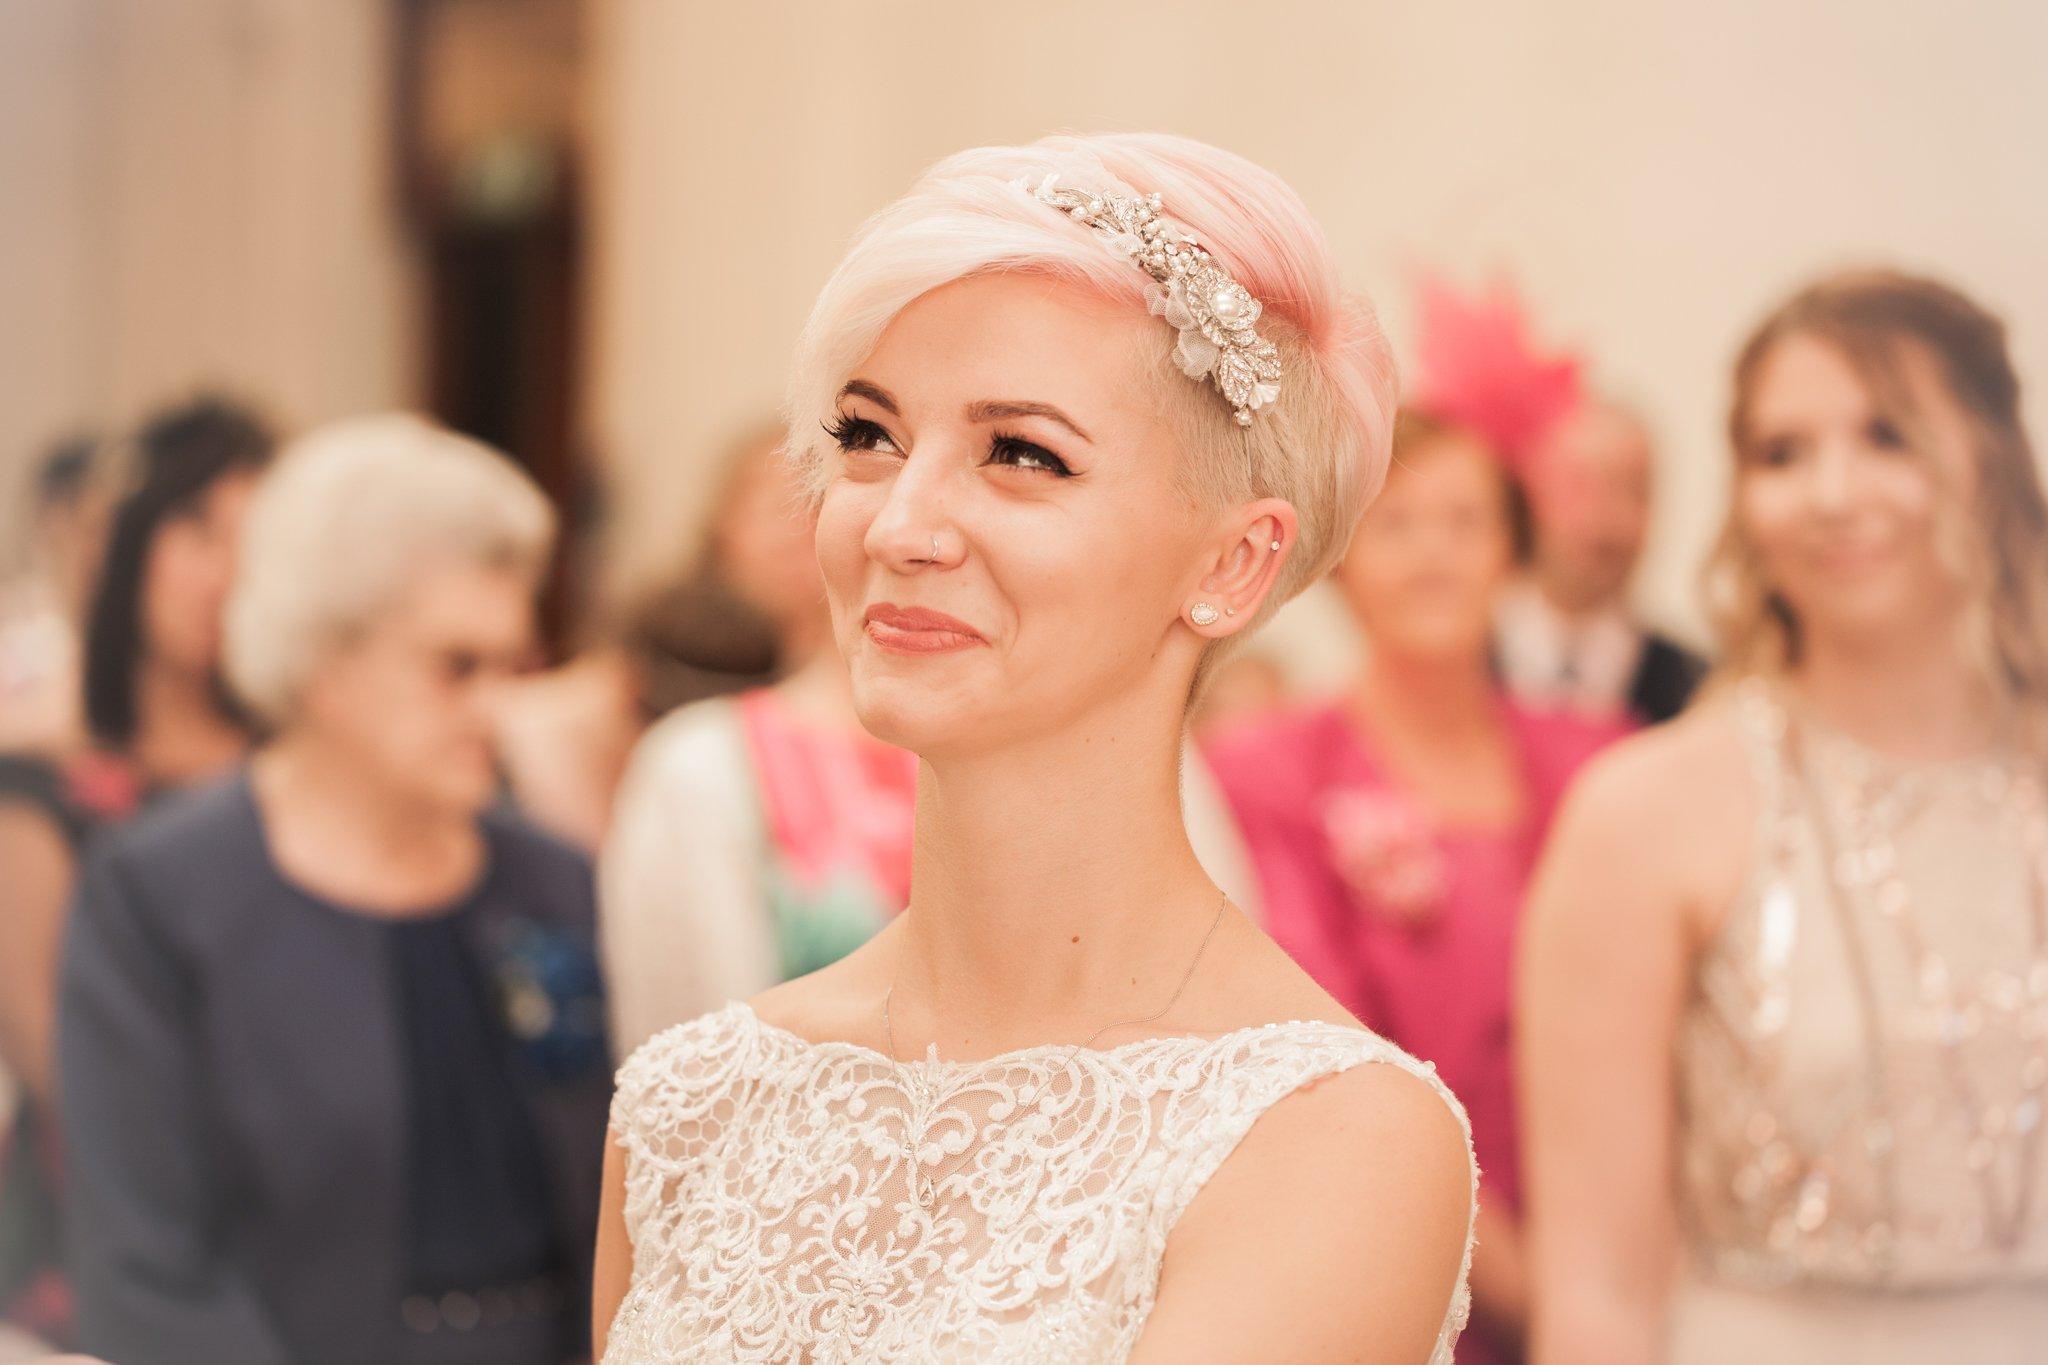 Portland House Cardiff Wedding, Beautiful bride, Tania Miller Photography, Cardiff wedding photographer